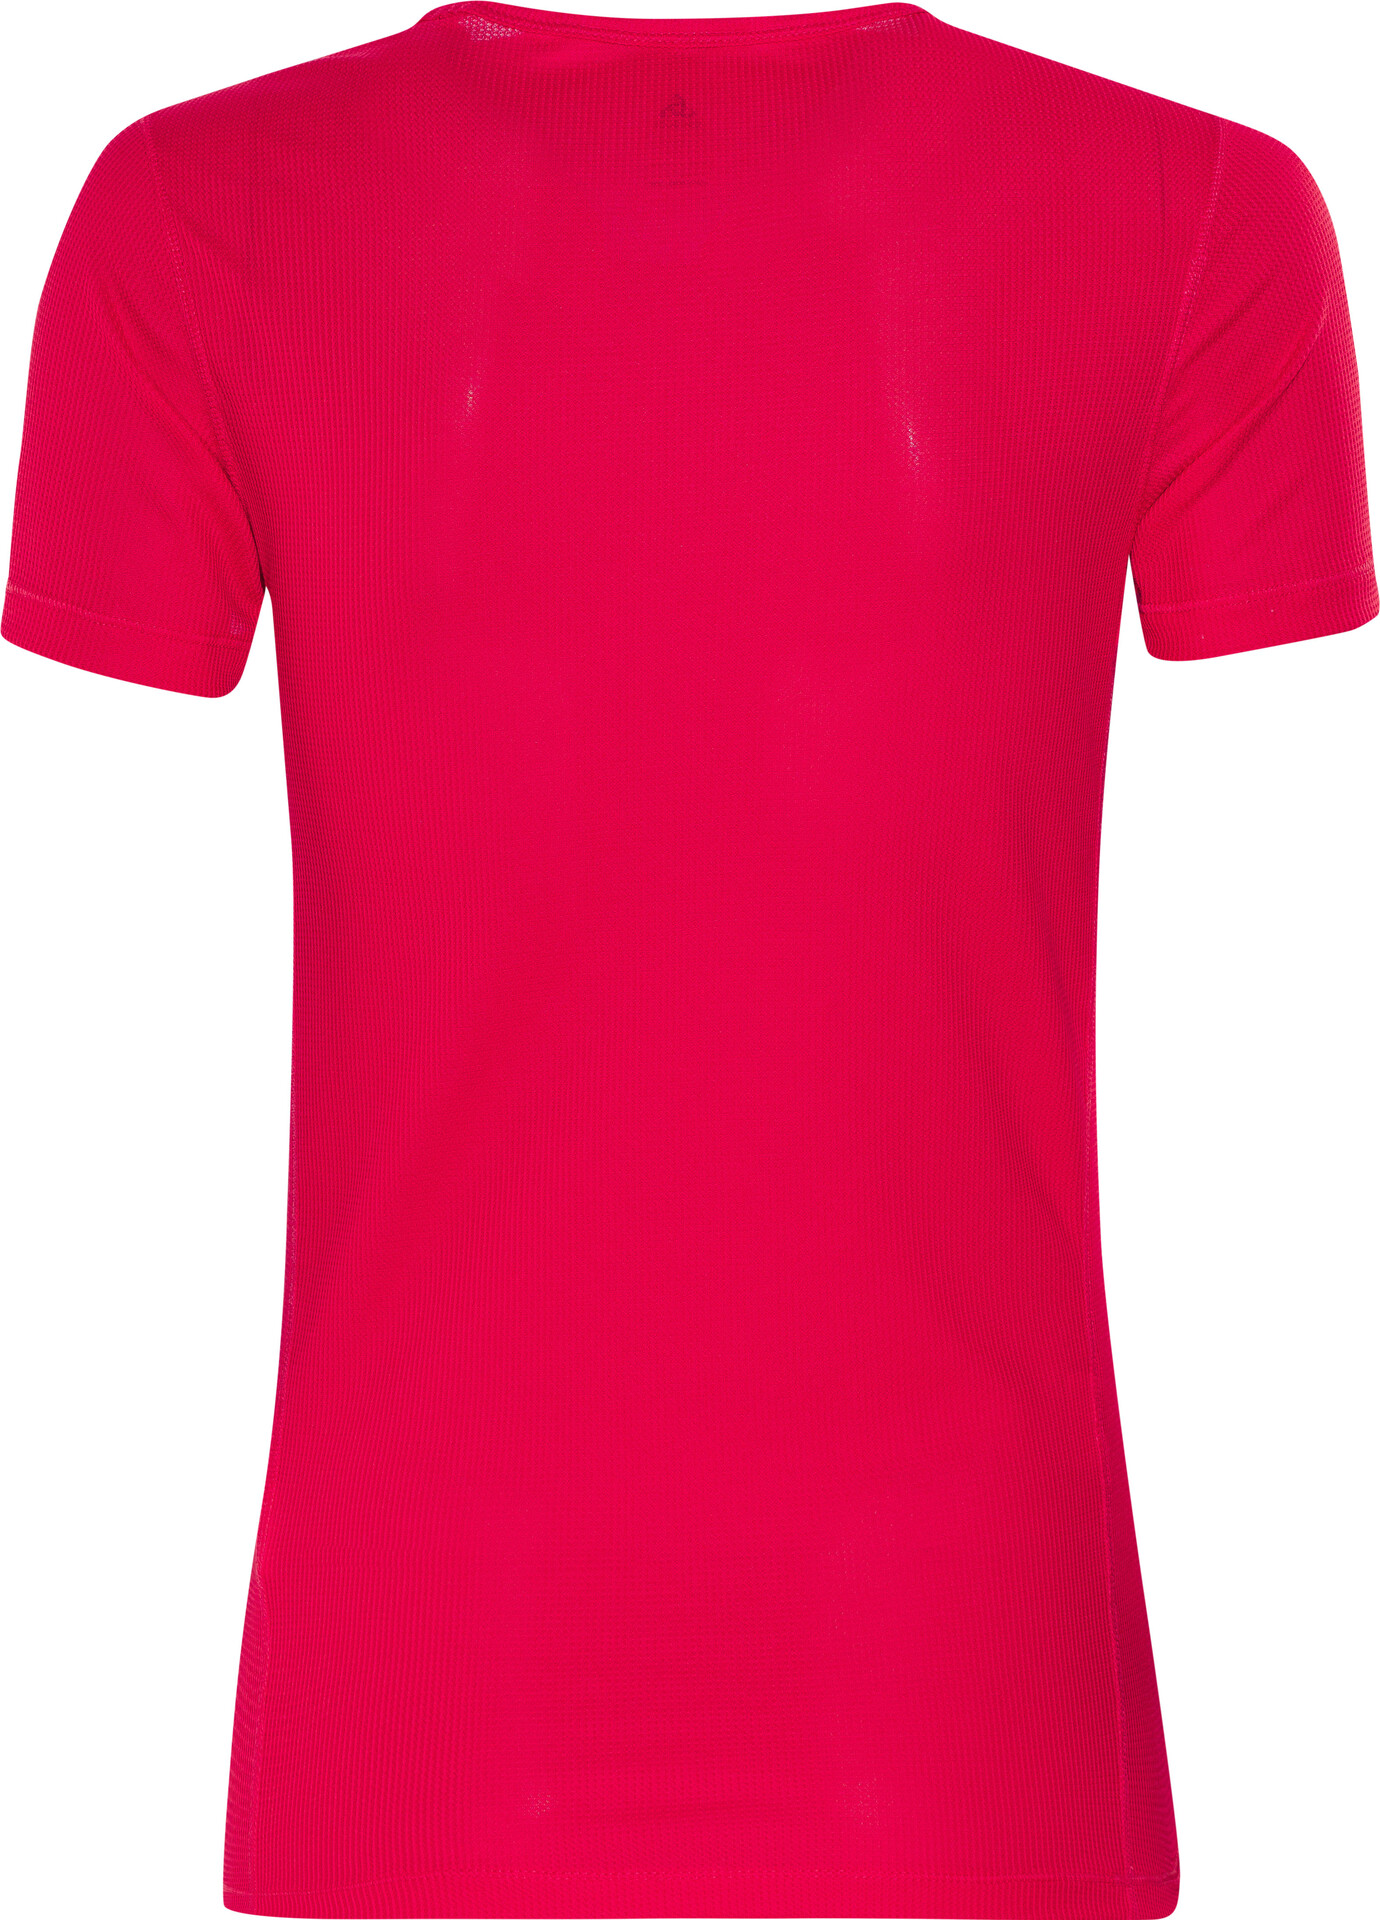 Odlo Camiseta Interior de Cuello Redondo para Mujer.